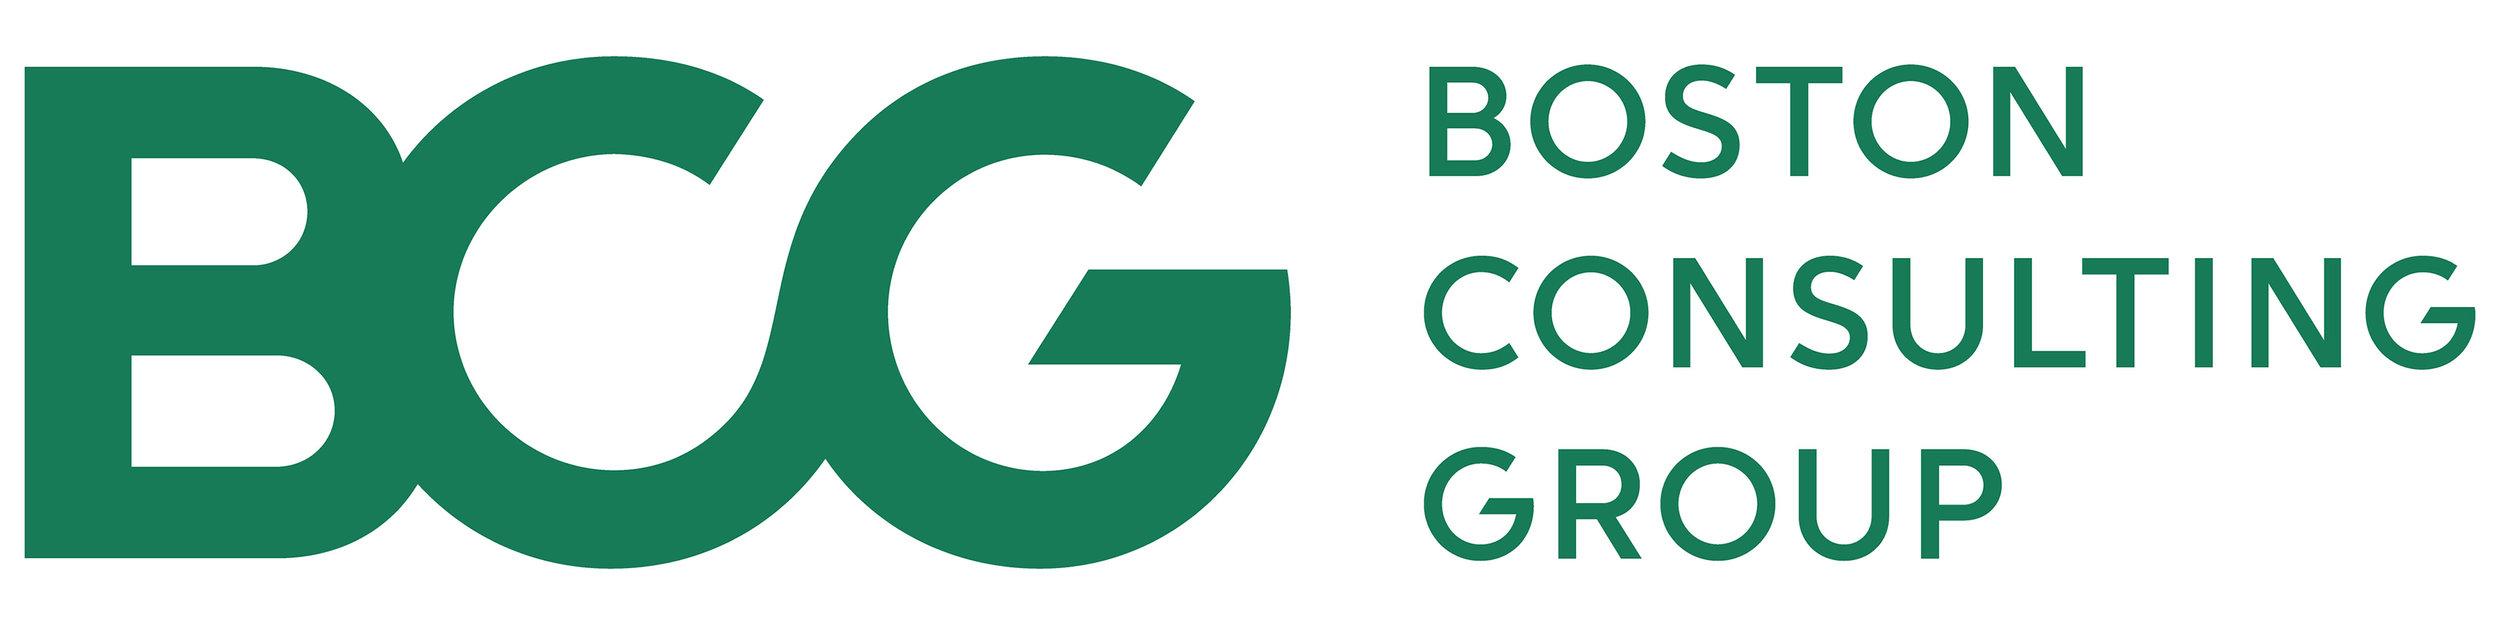 boston_consulting_group_logo.jpg